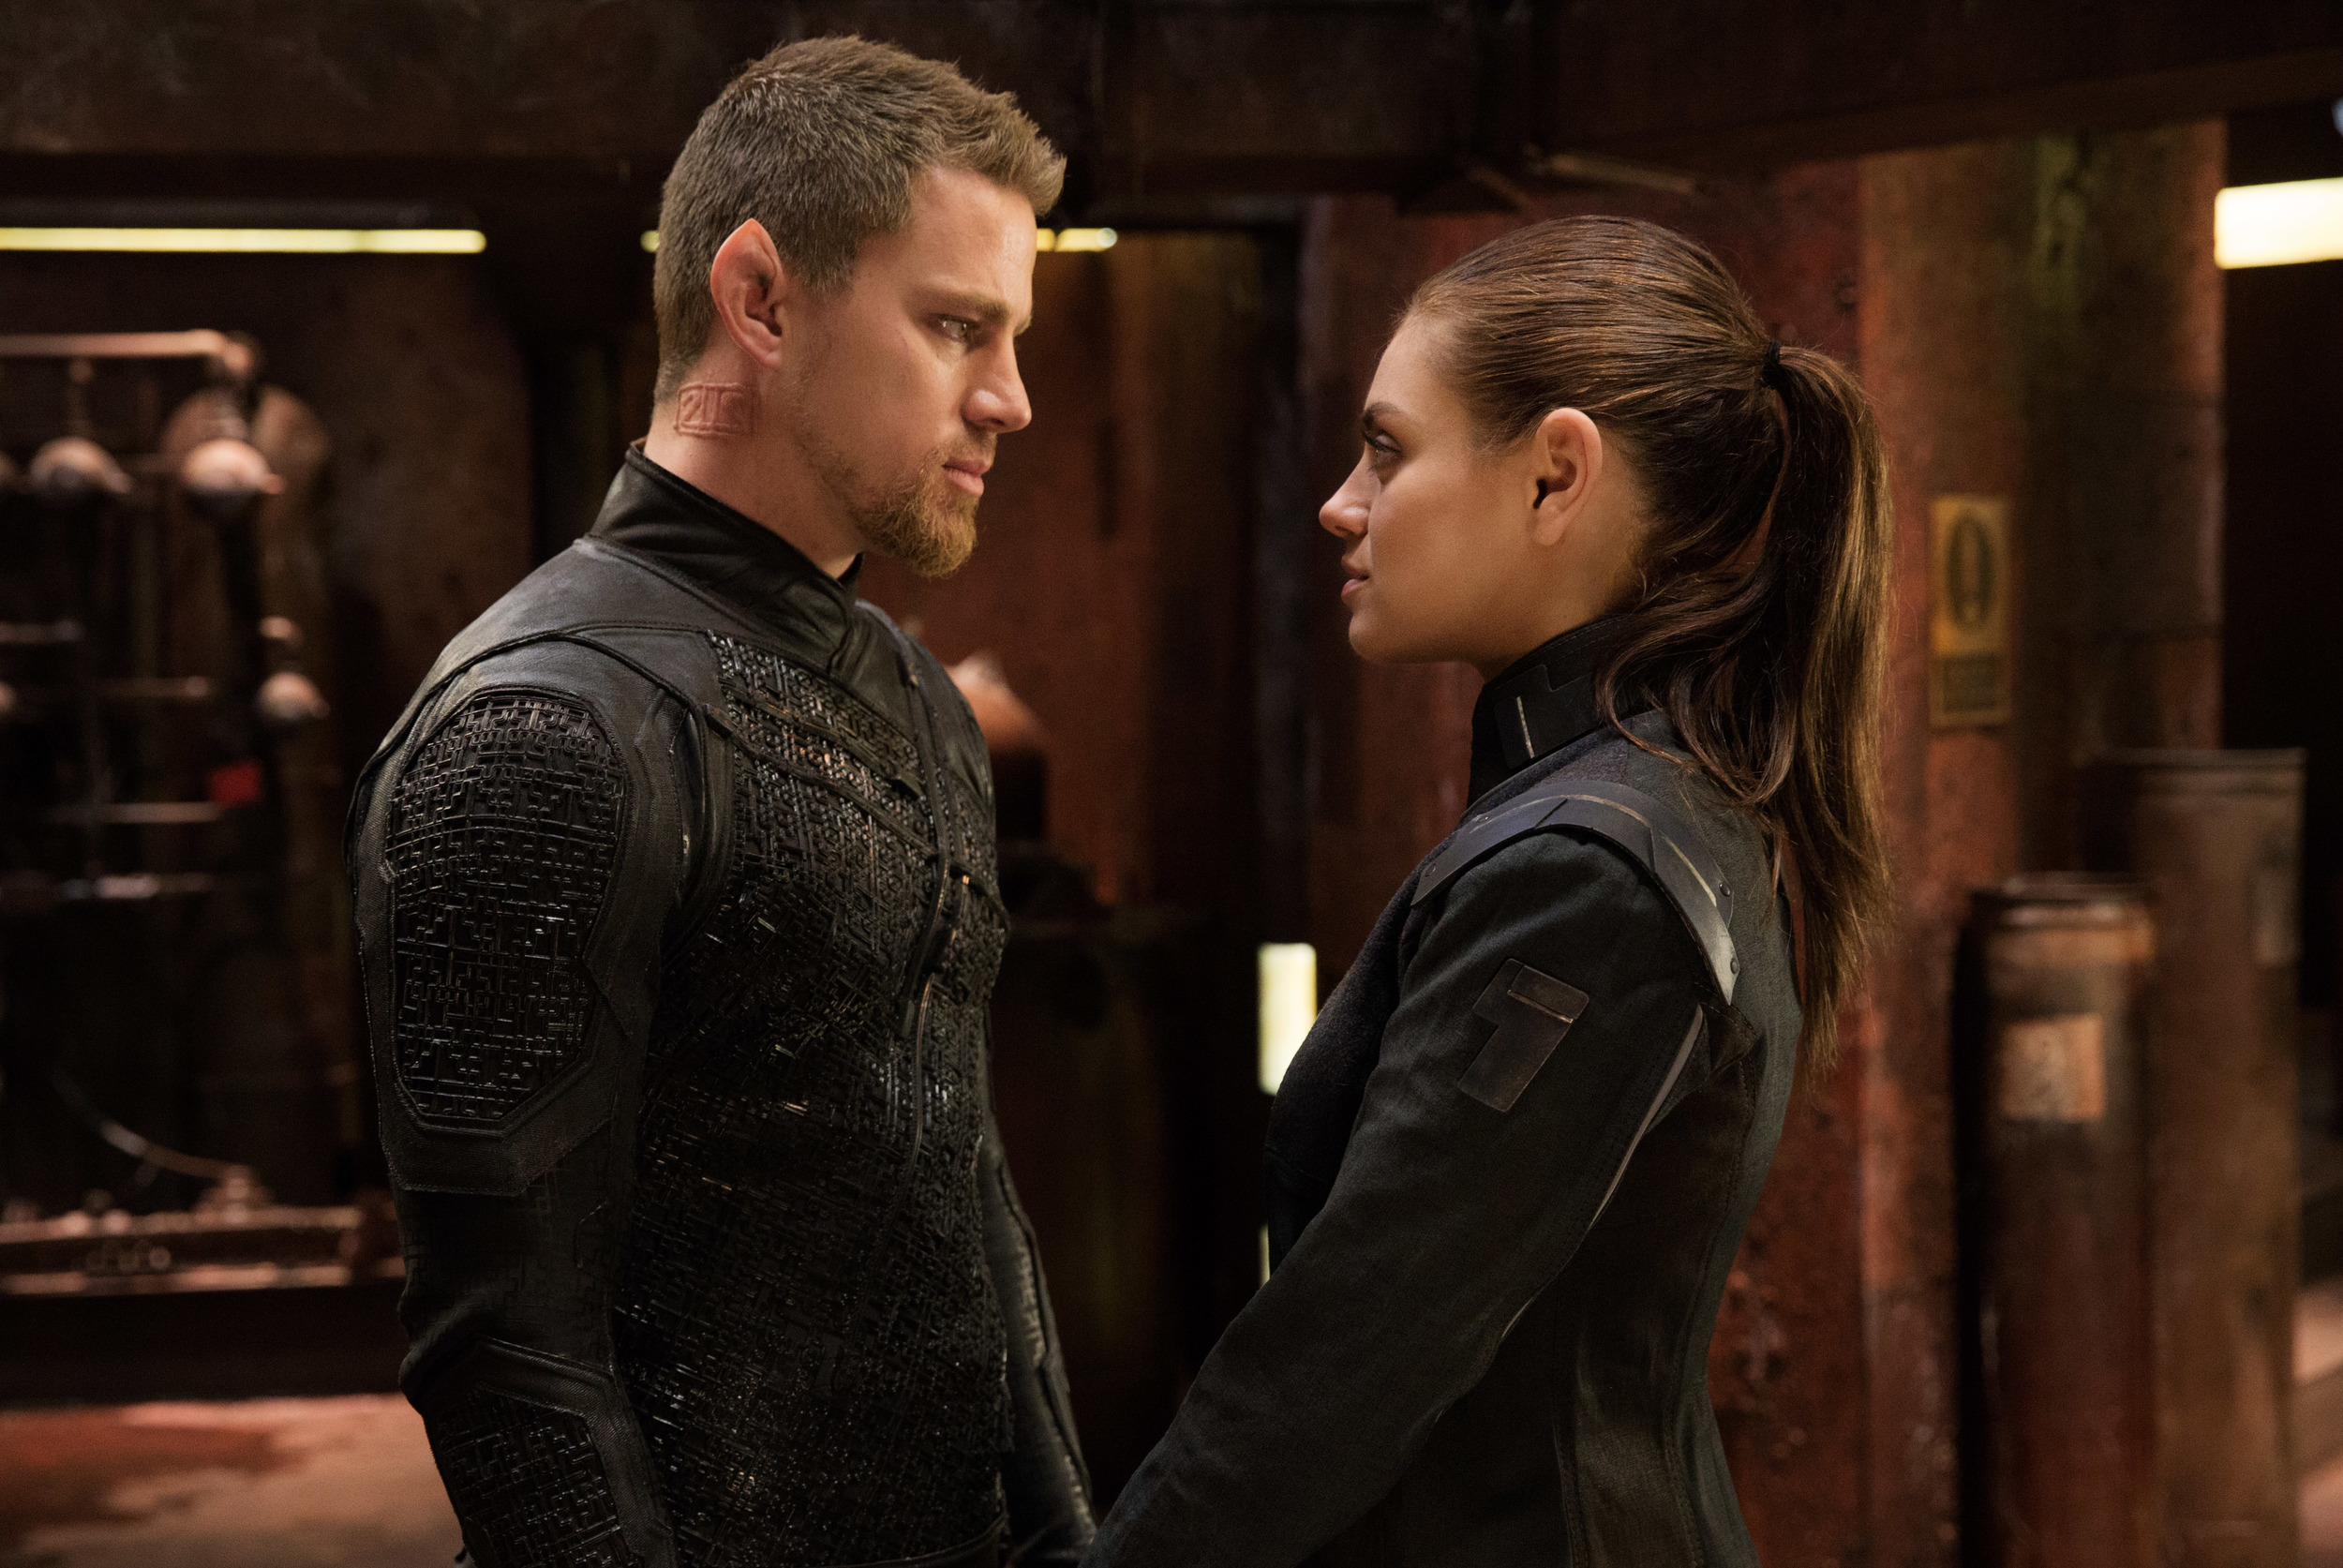 Channing Tatum and Mila Kunis in  Jupiter Ascending (Murray Close/Warner Bros.)